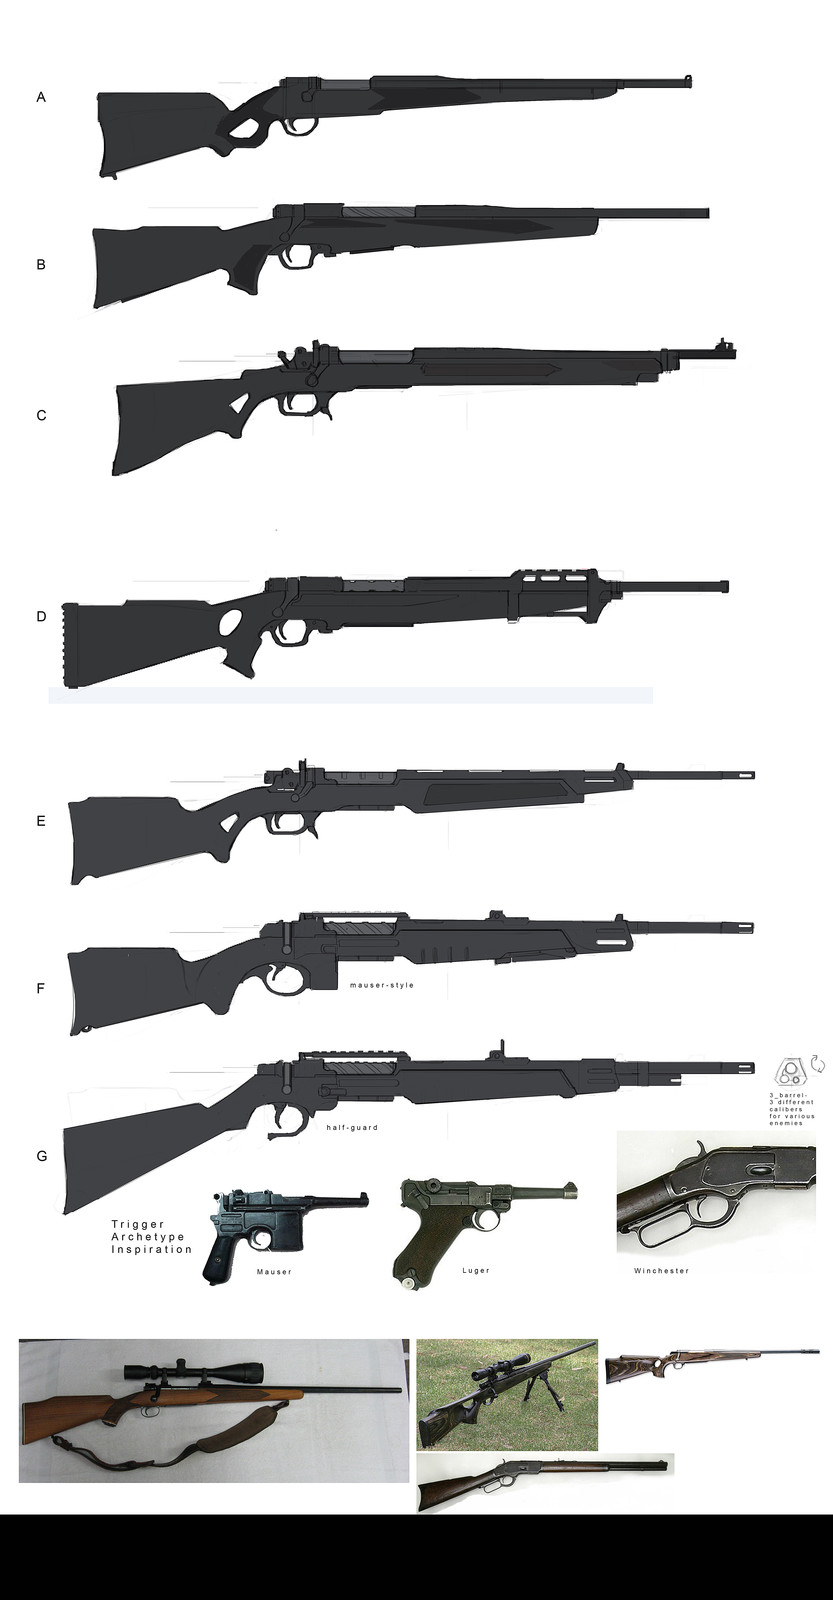 Rifle thumbnails